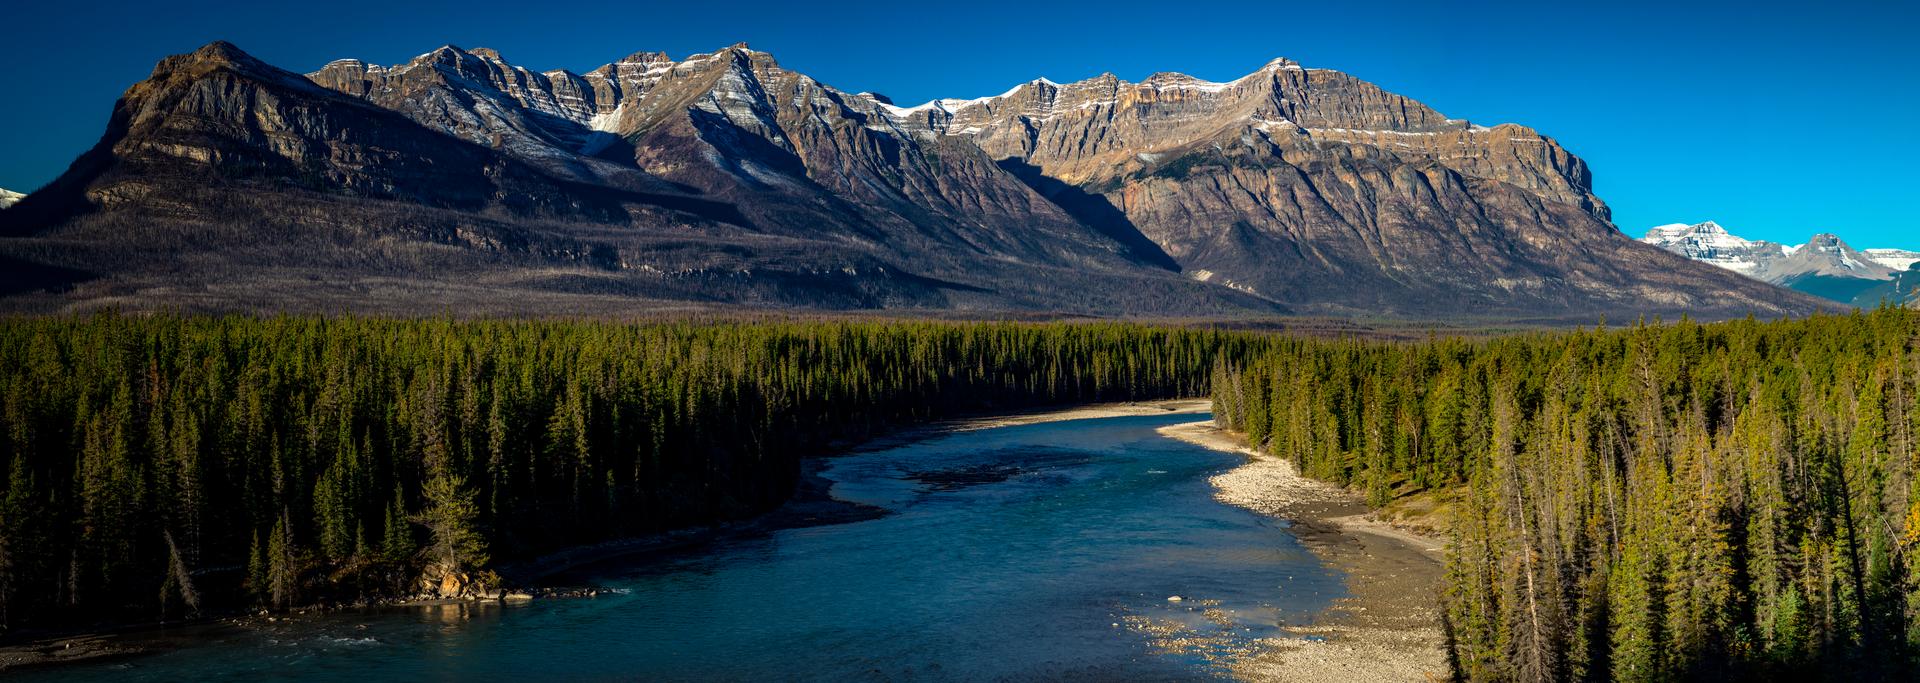 Alberta-Canada.png